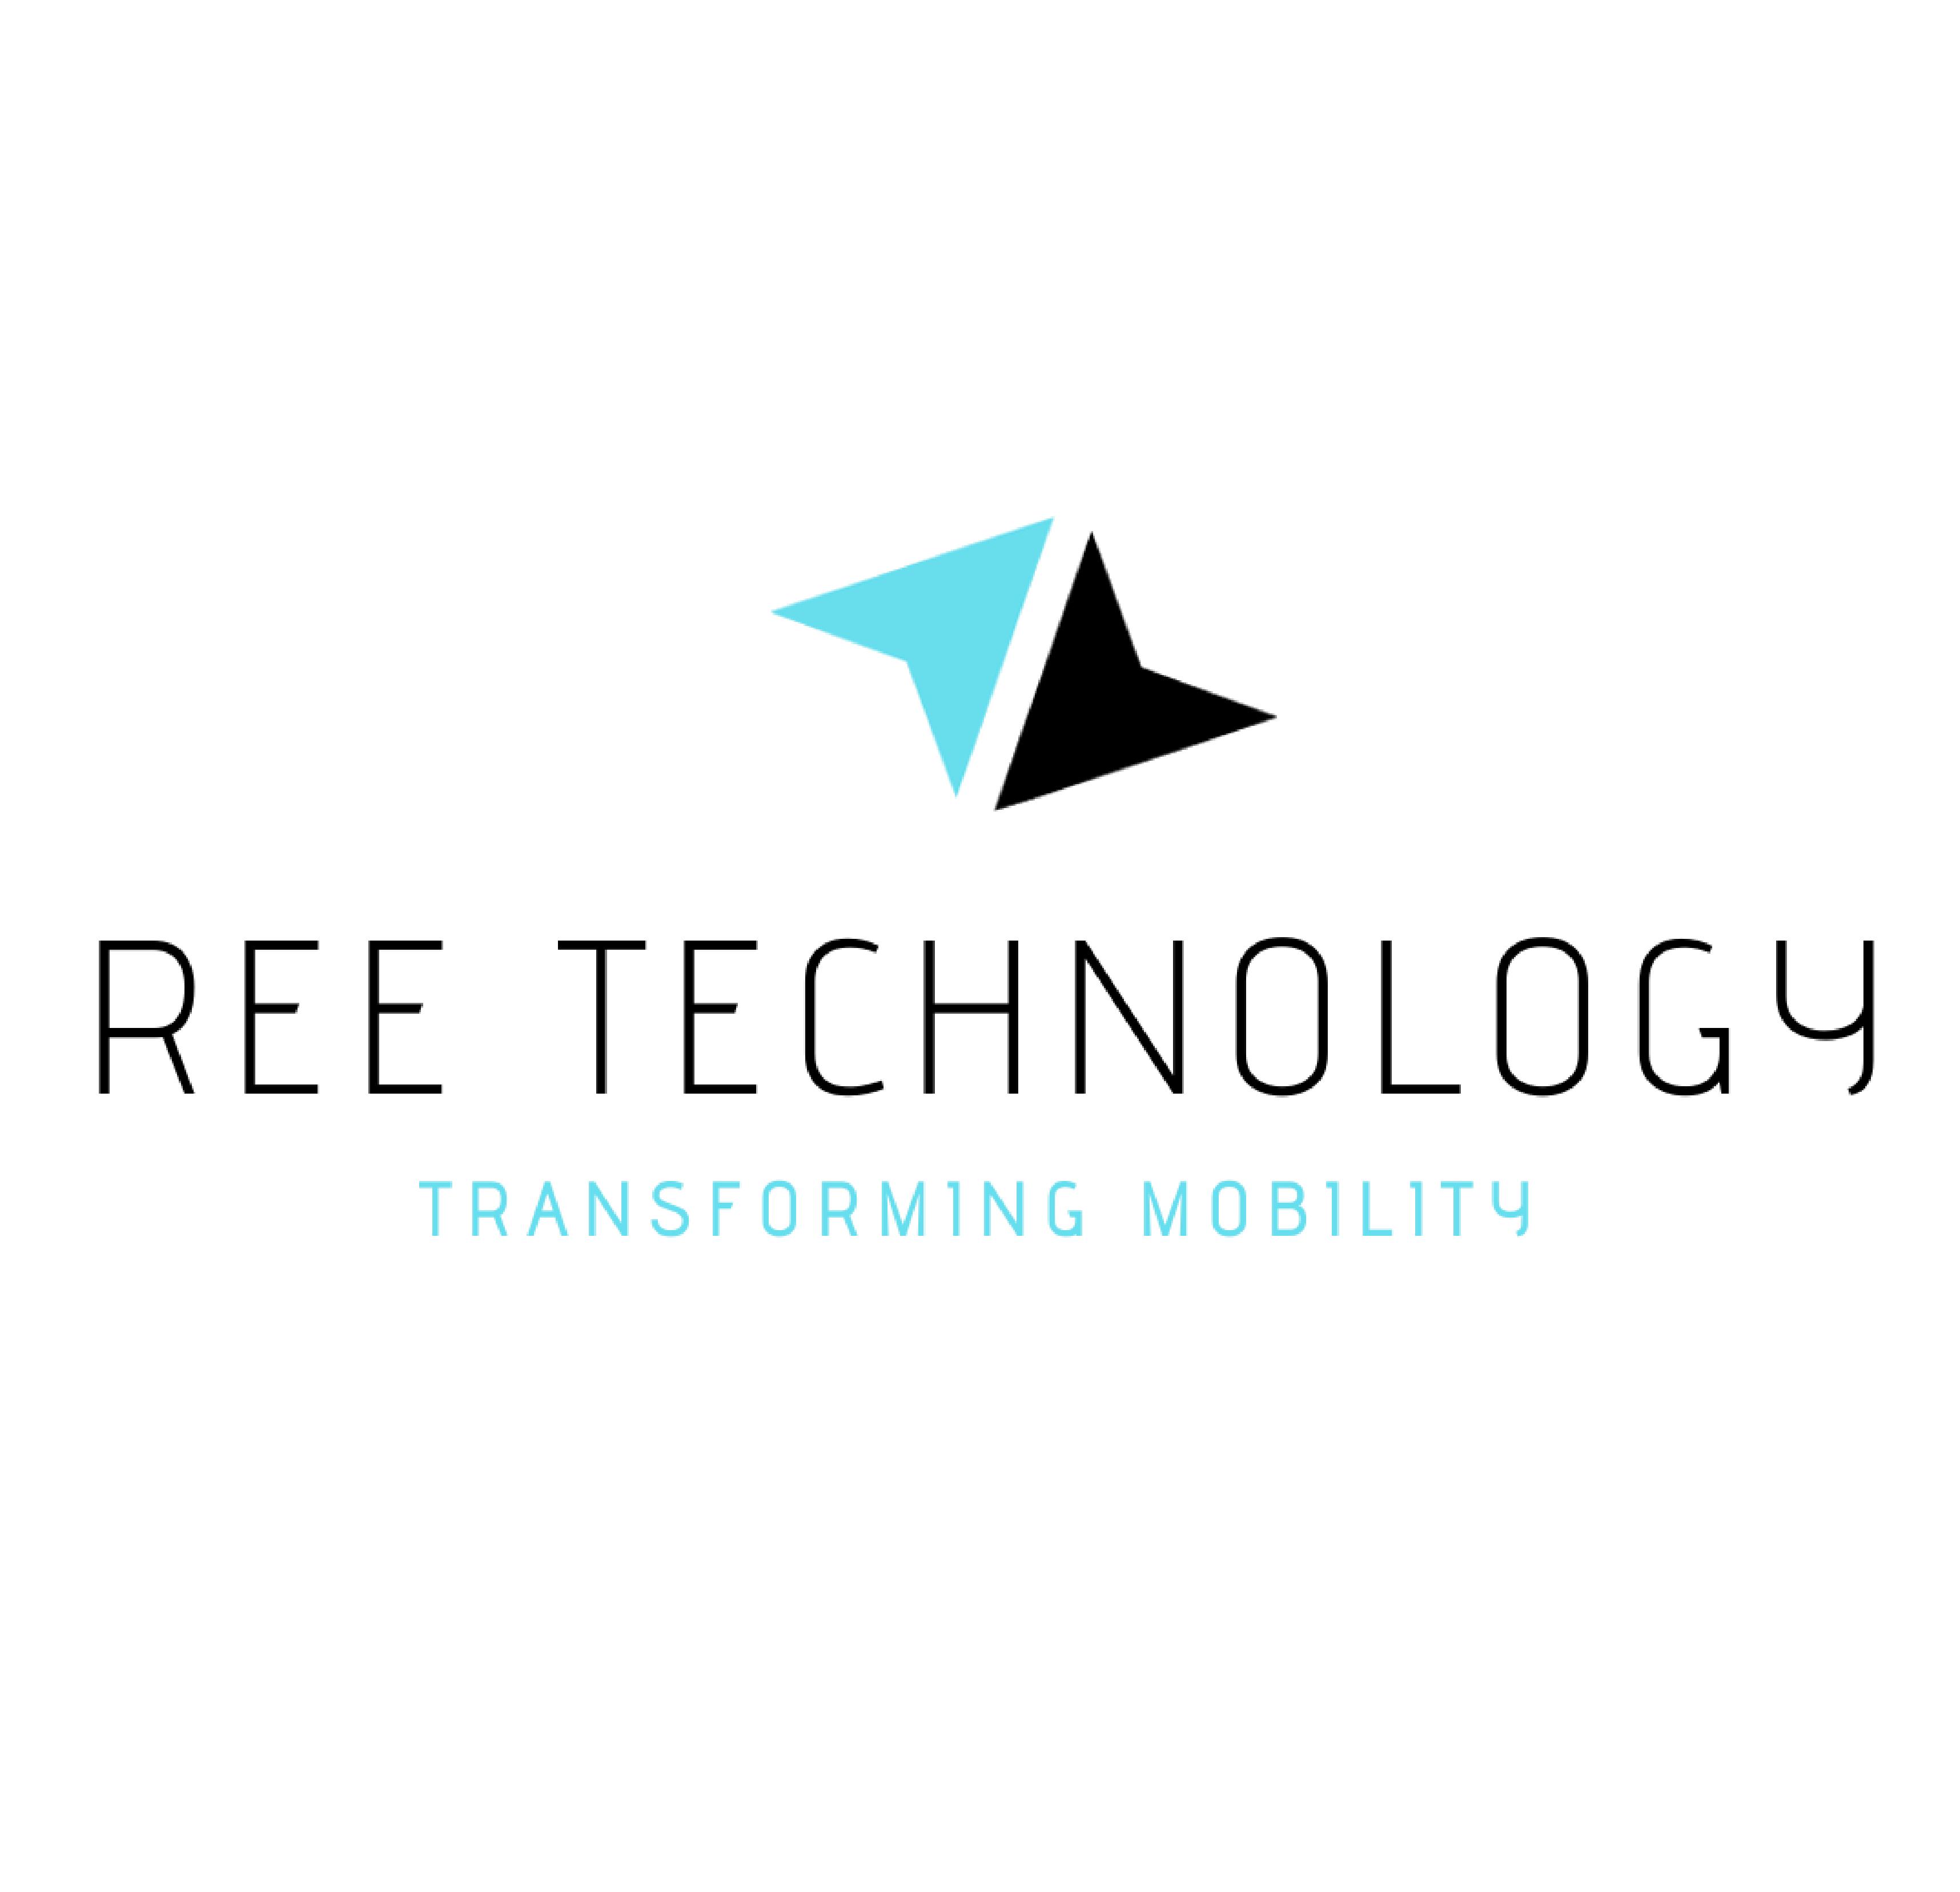 Ree Technology